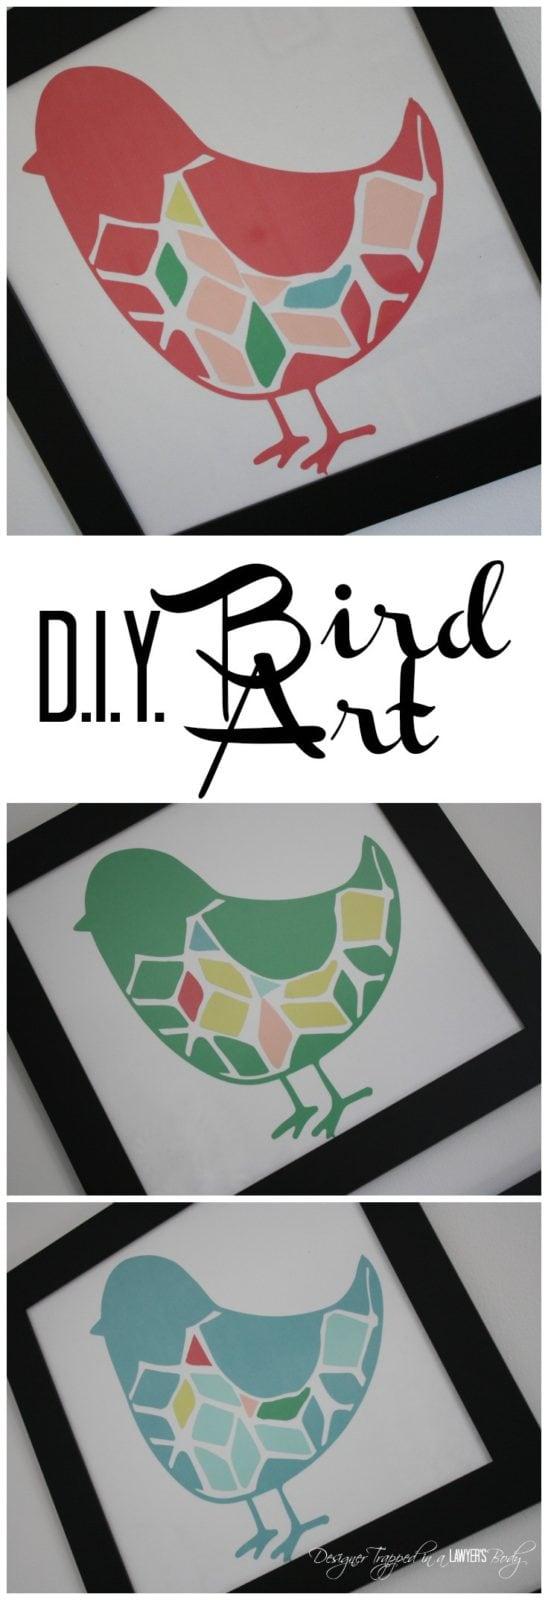 MUST PIN! Awesome DIY bird wall art--full tutorial. #diyart #birdart